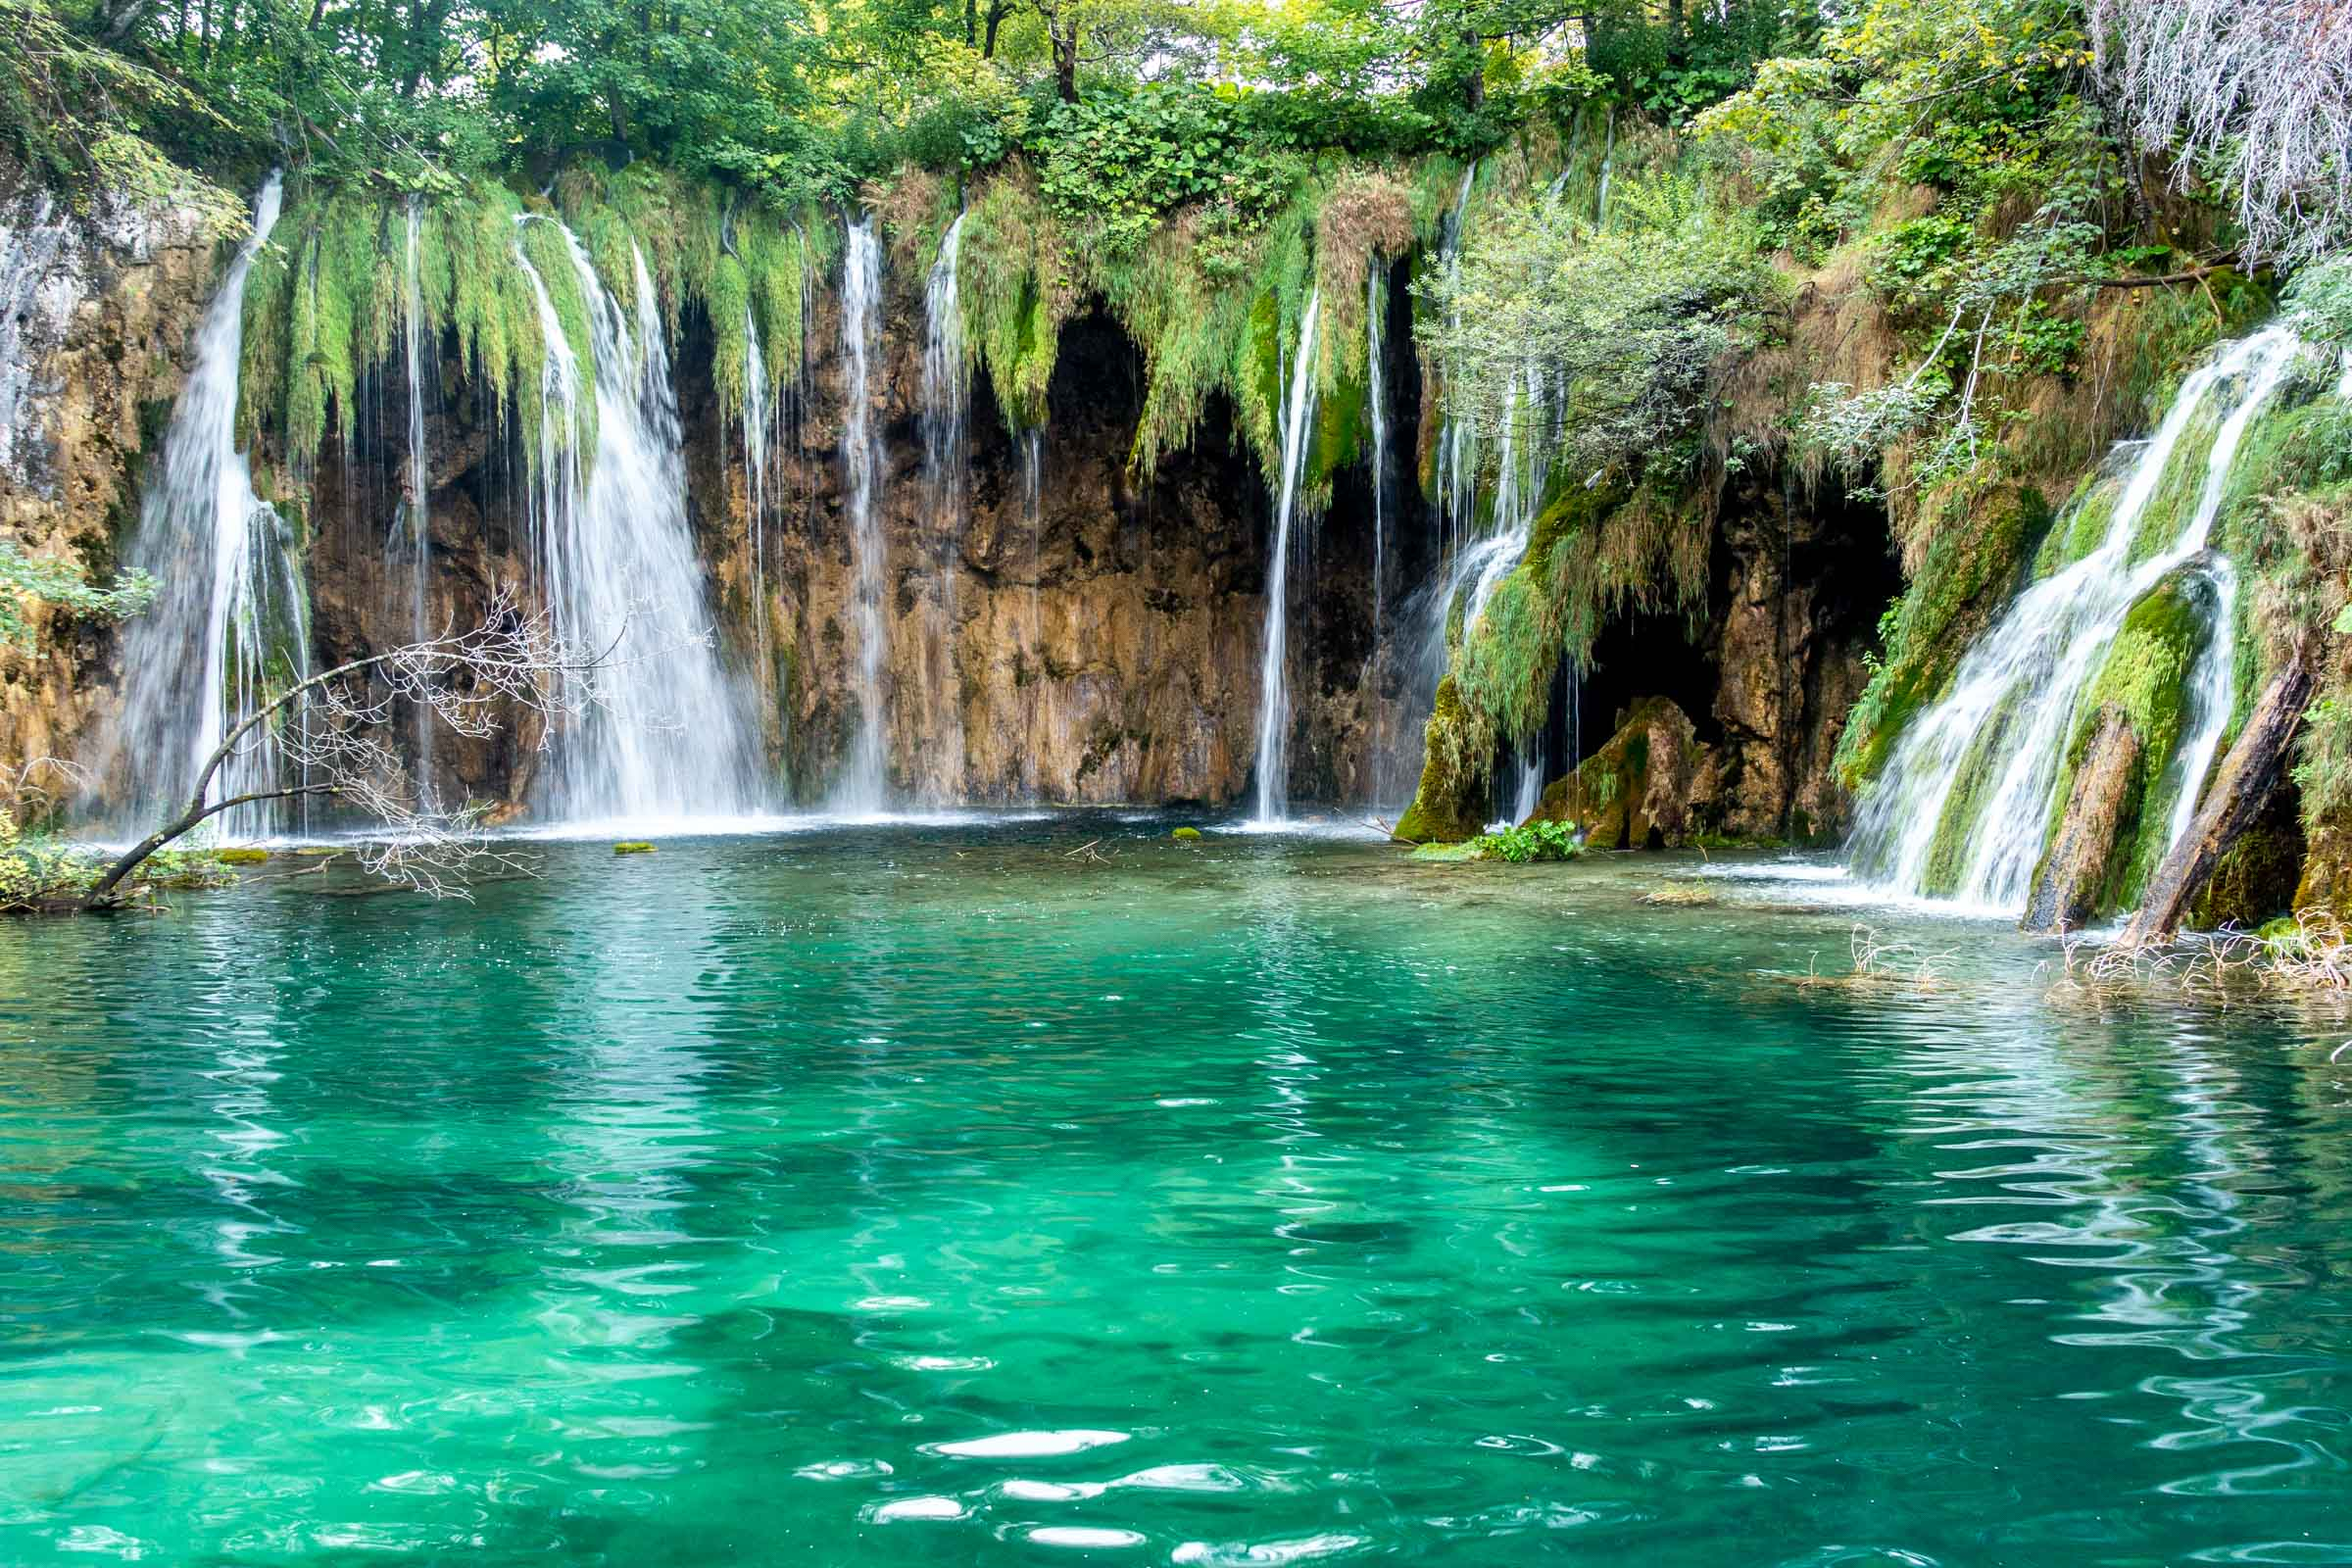 Waterfalls falling into lake at Pltvice Lakes National Park in Croatia